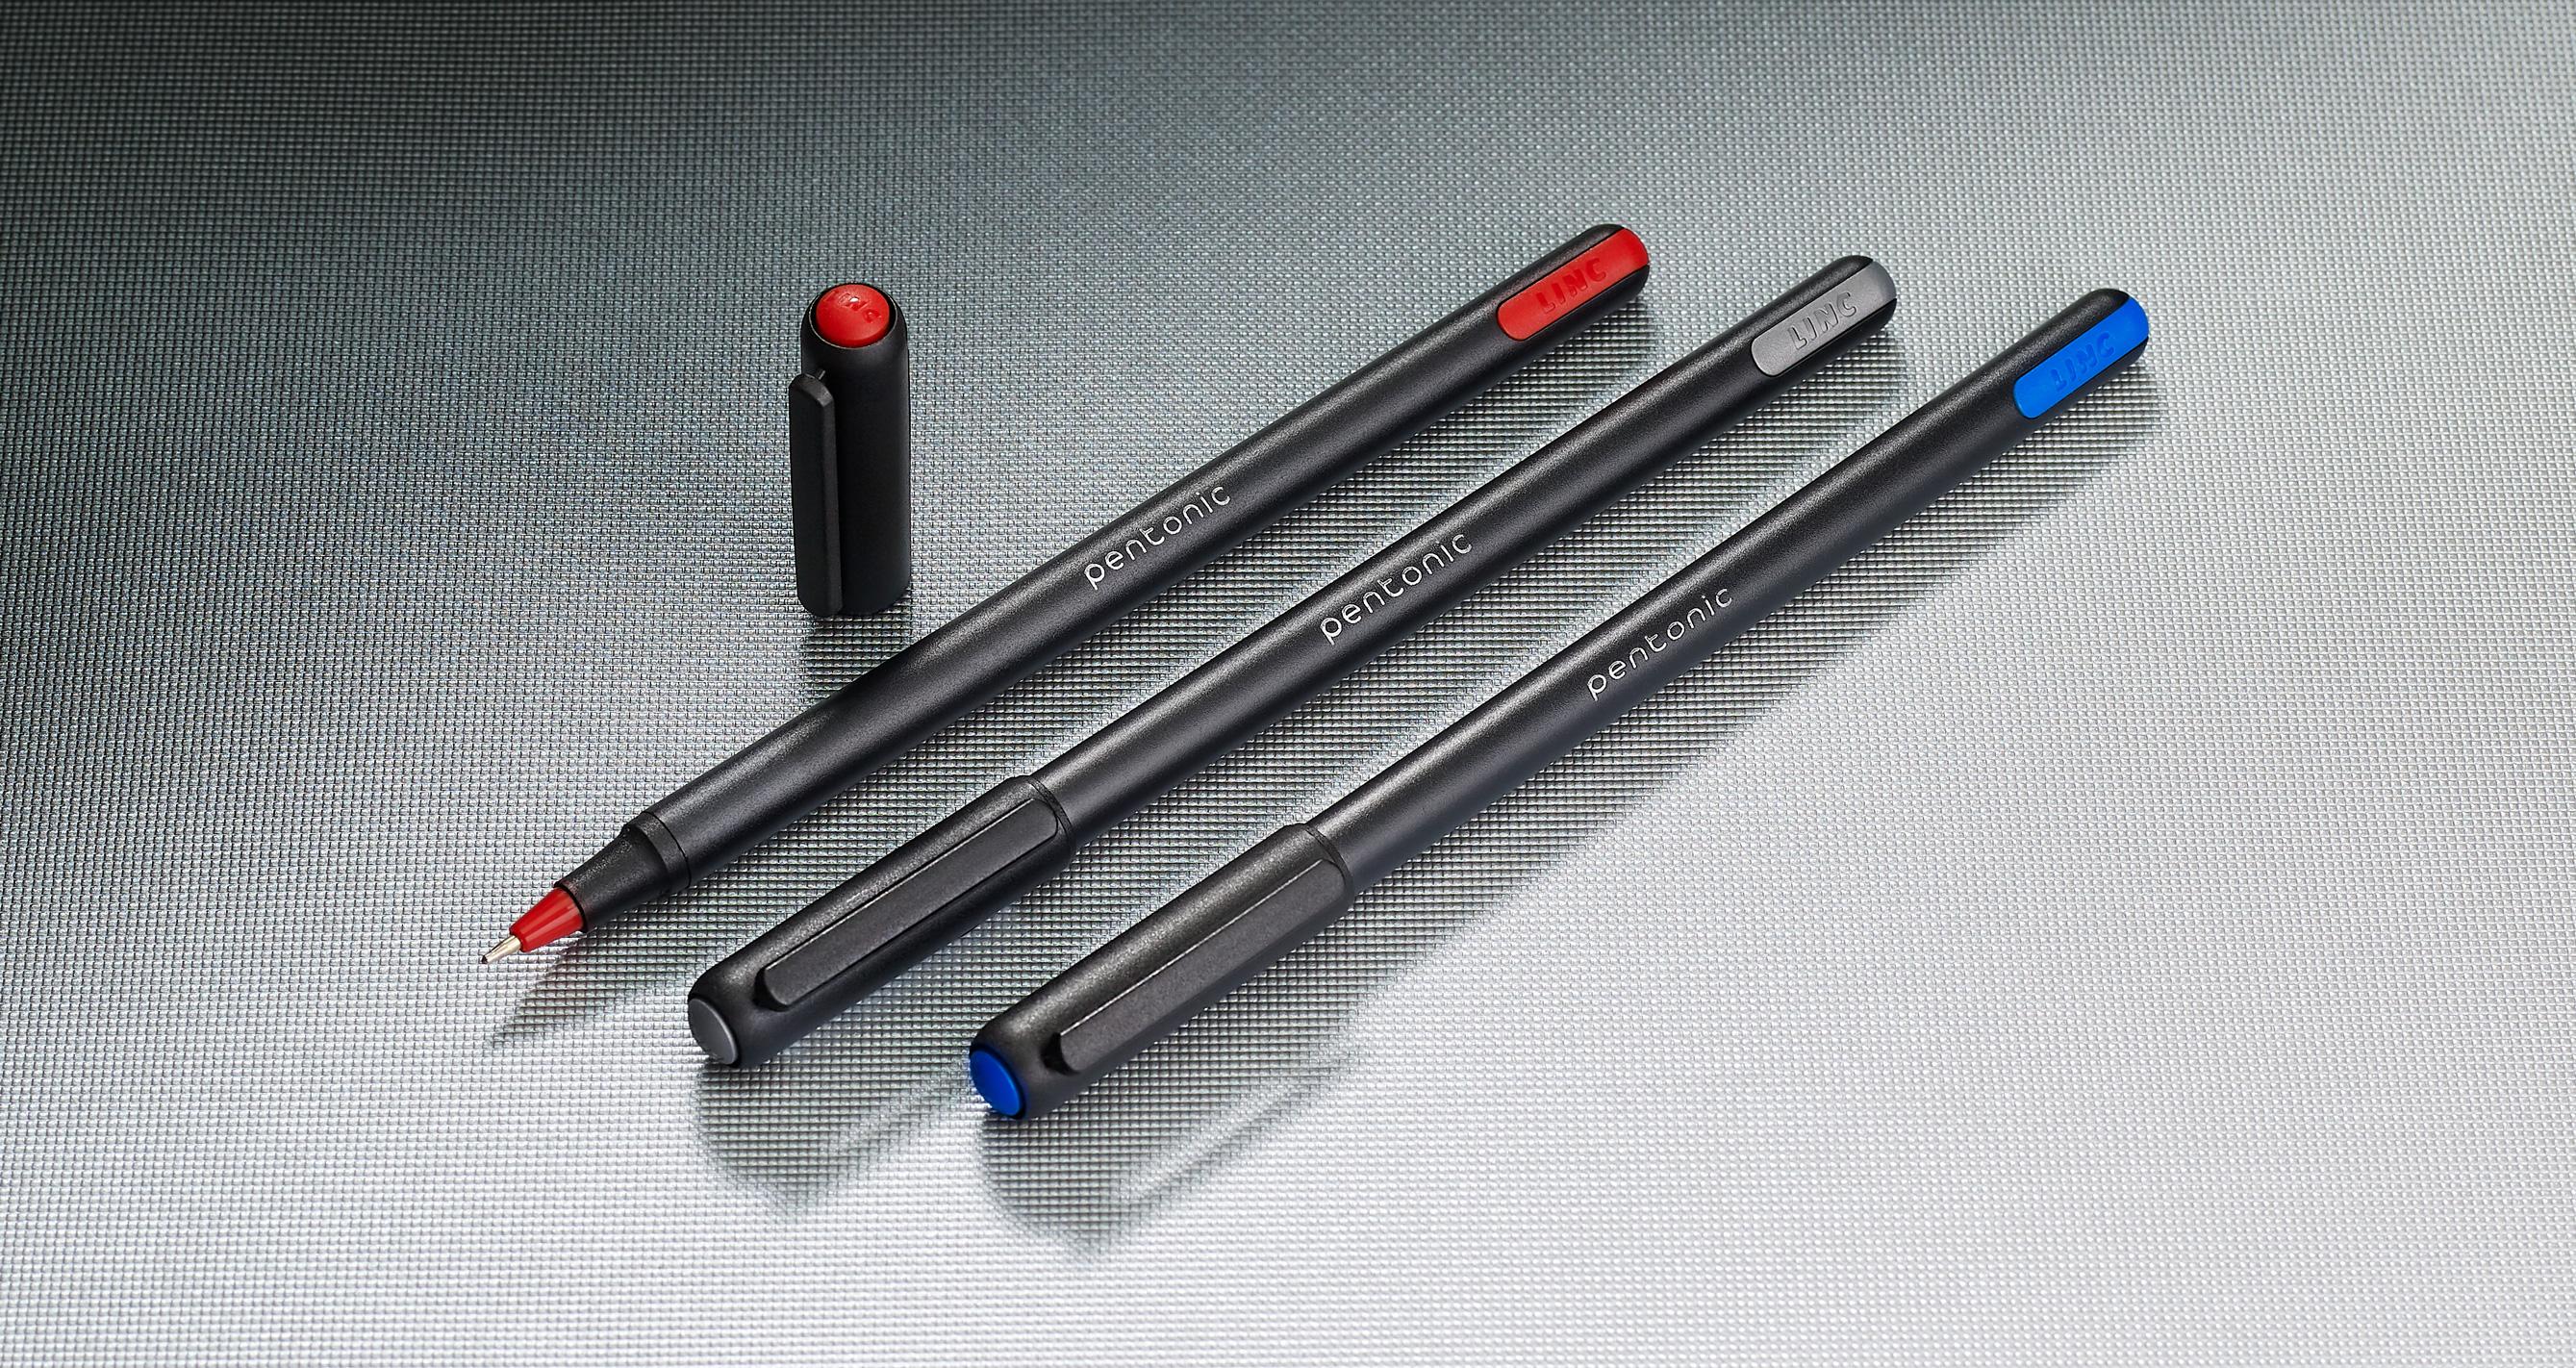 Pentonic_pens_pencils